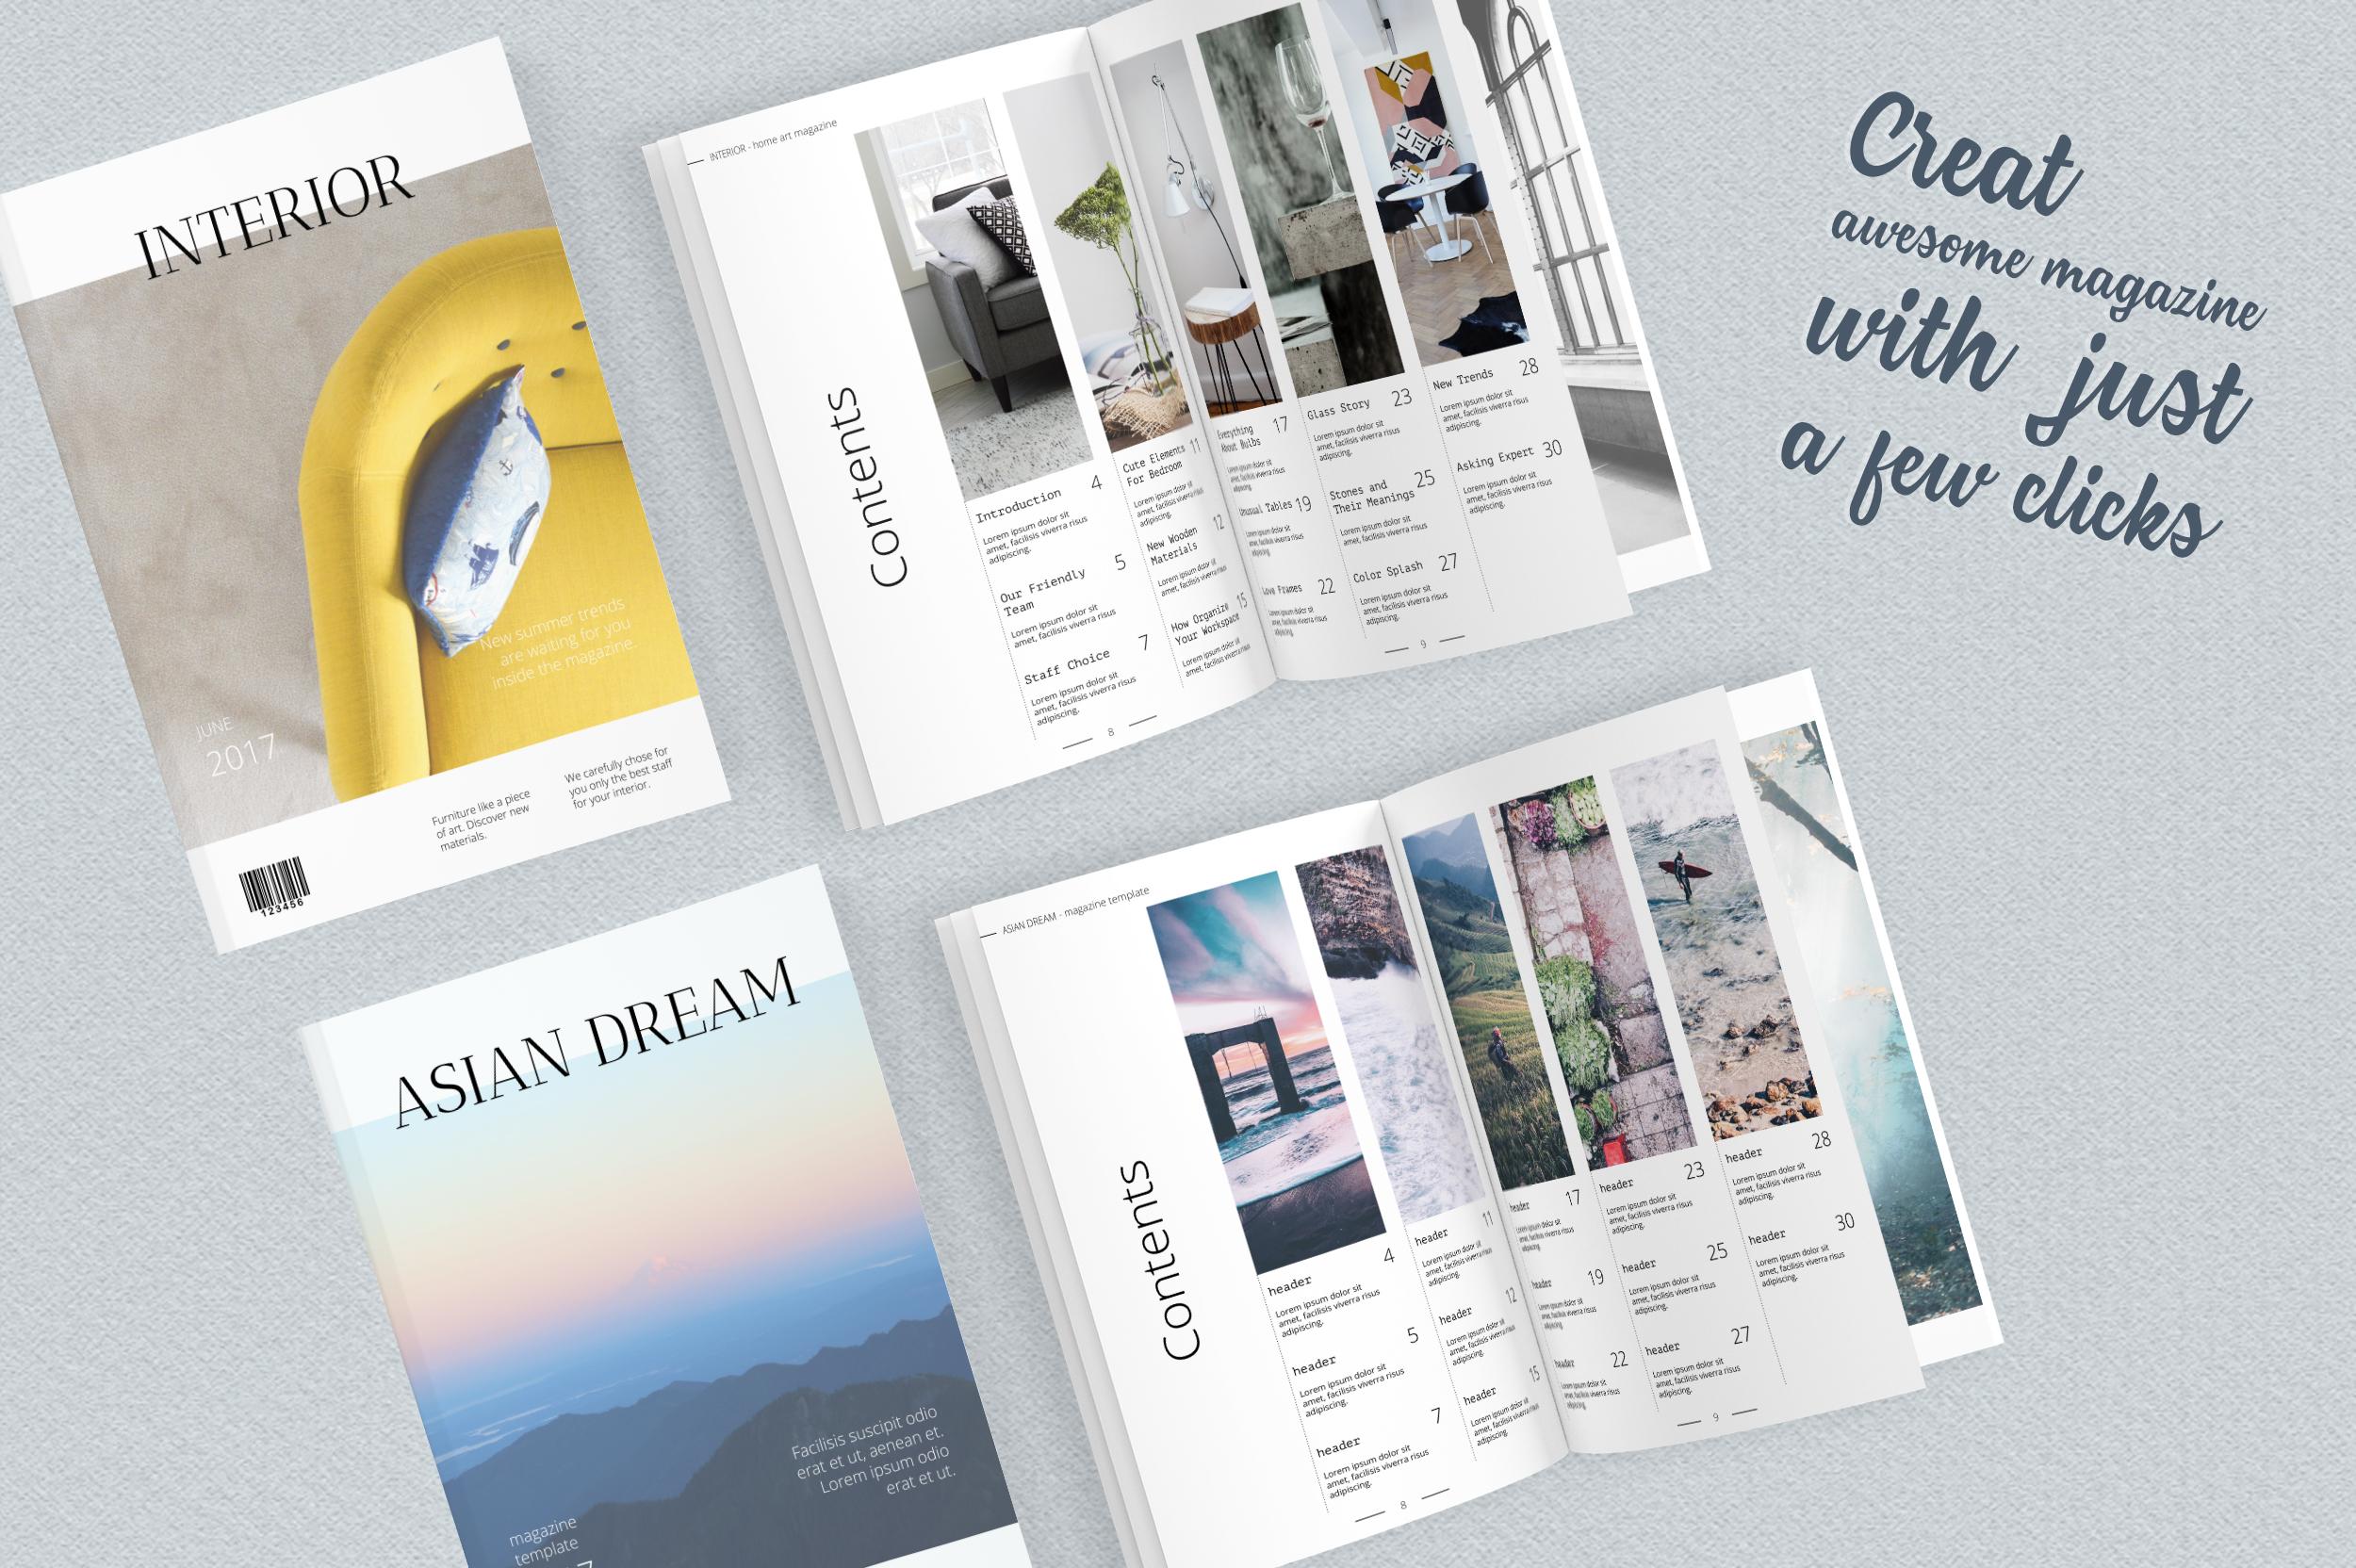 Asian Dream Magazine Template example image 5